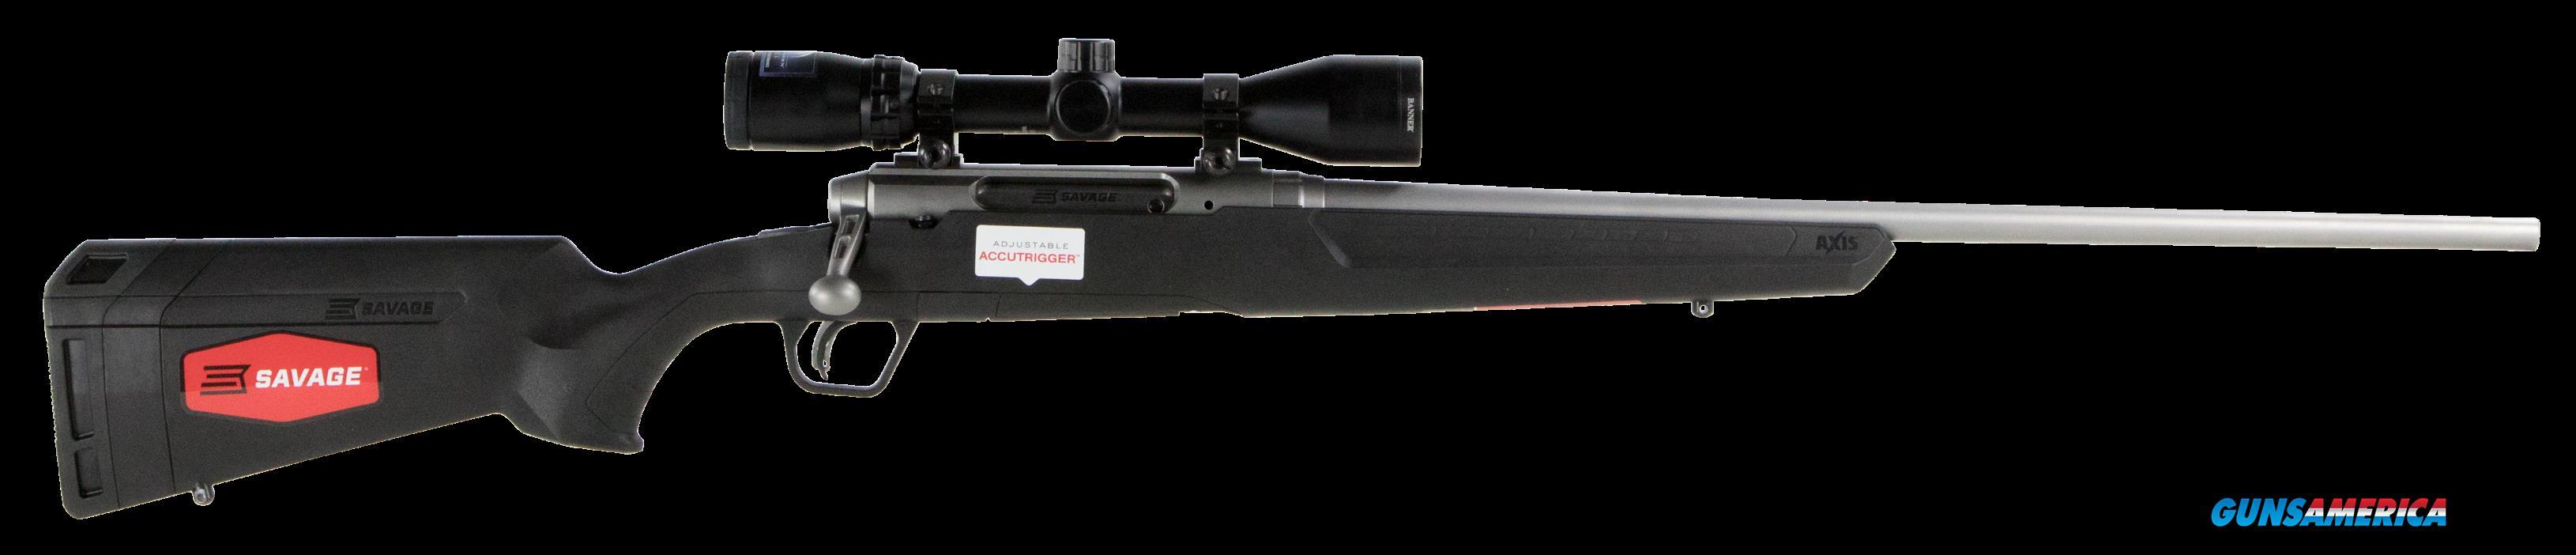 Savage Axis Ii, Sav 57103 Axis Ii Xp Ss  243 Win          Bushnell  Guns > Pistols > 1911 Pistol Copies (non-Colt)